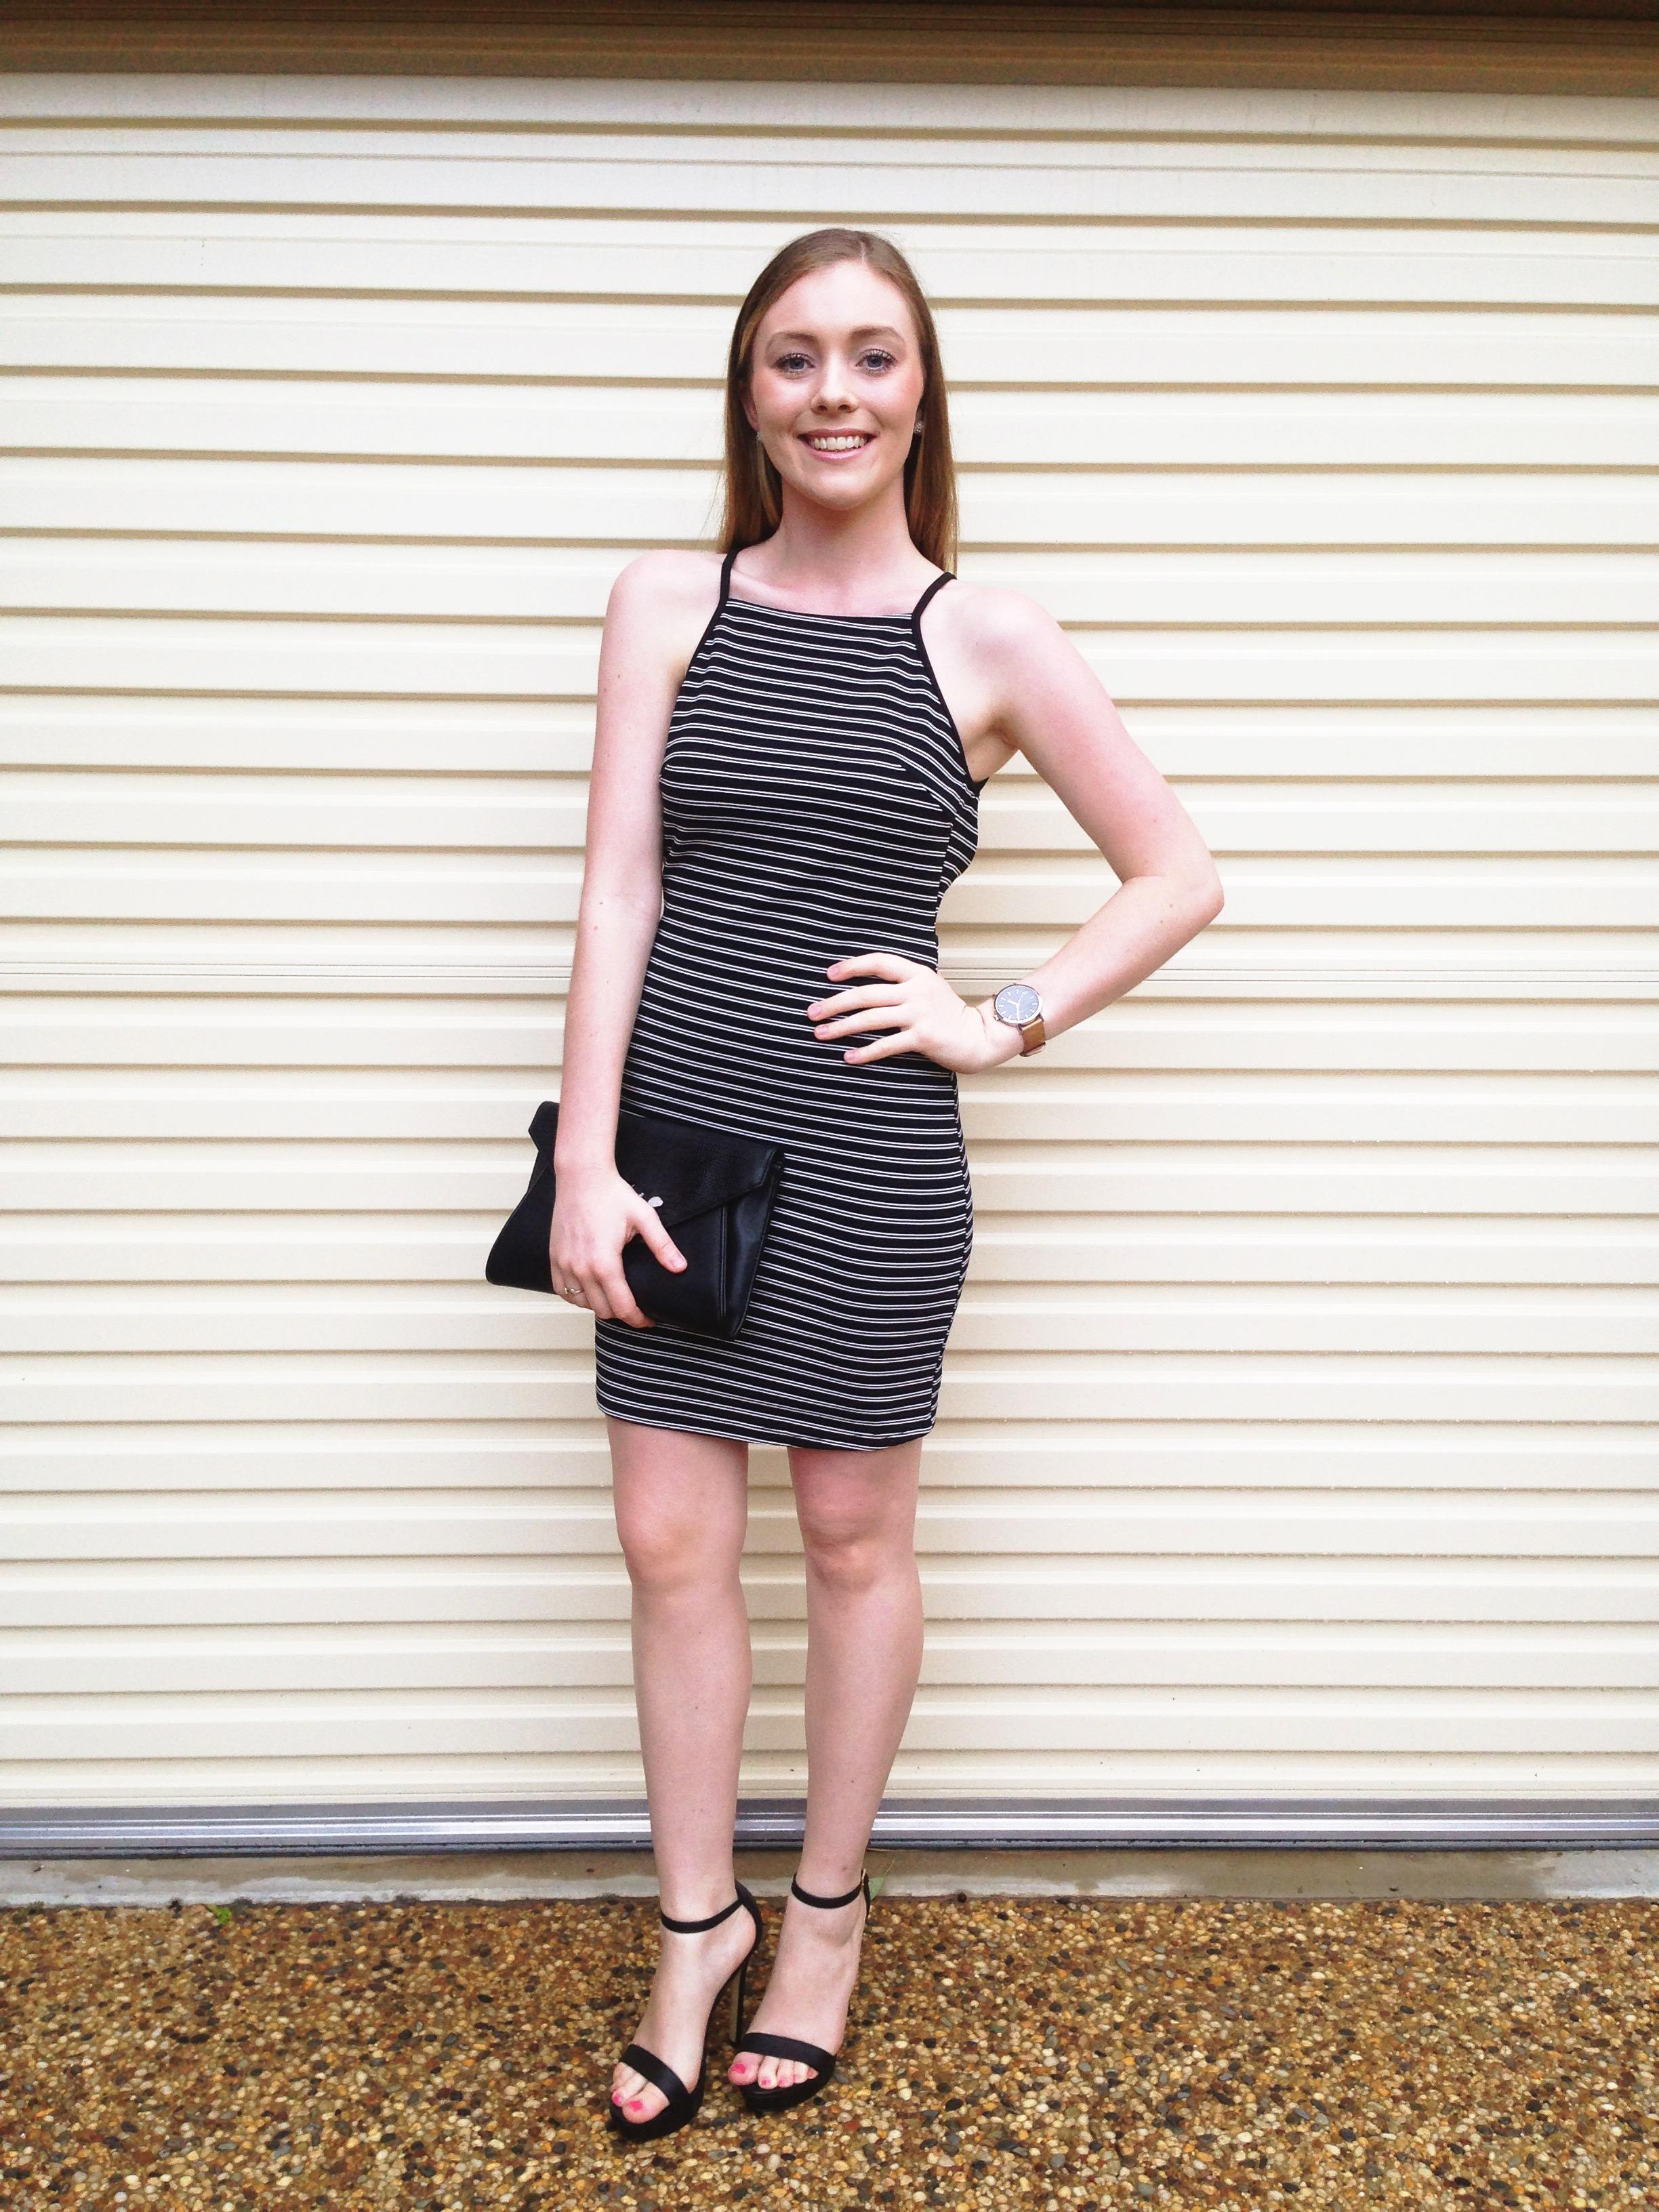 Flat Shoes For Black Dress